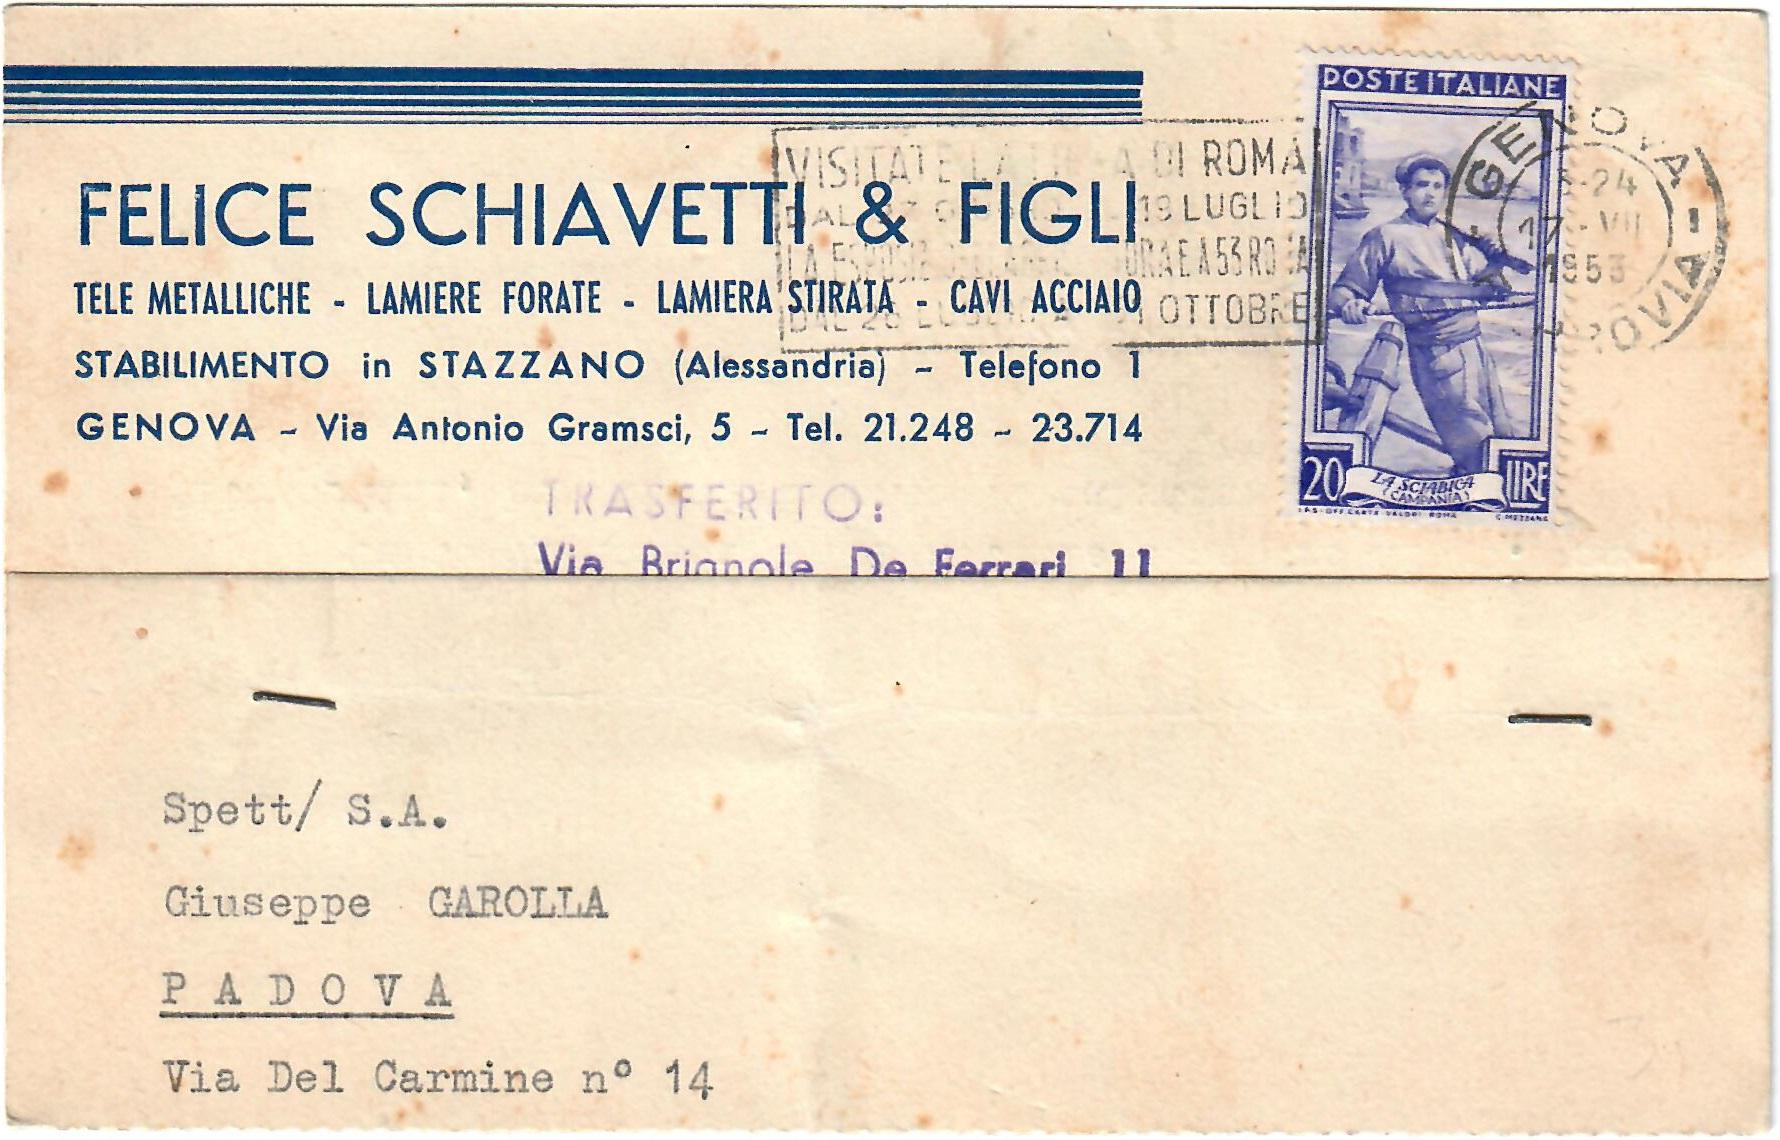 cei0599_isolato_cartolina_fiera_roma